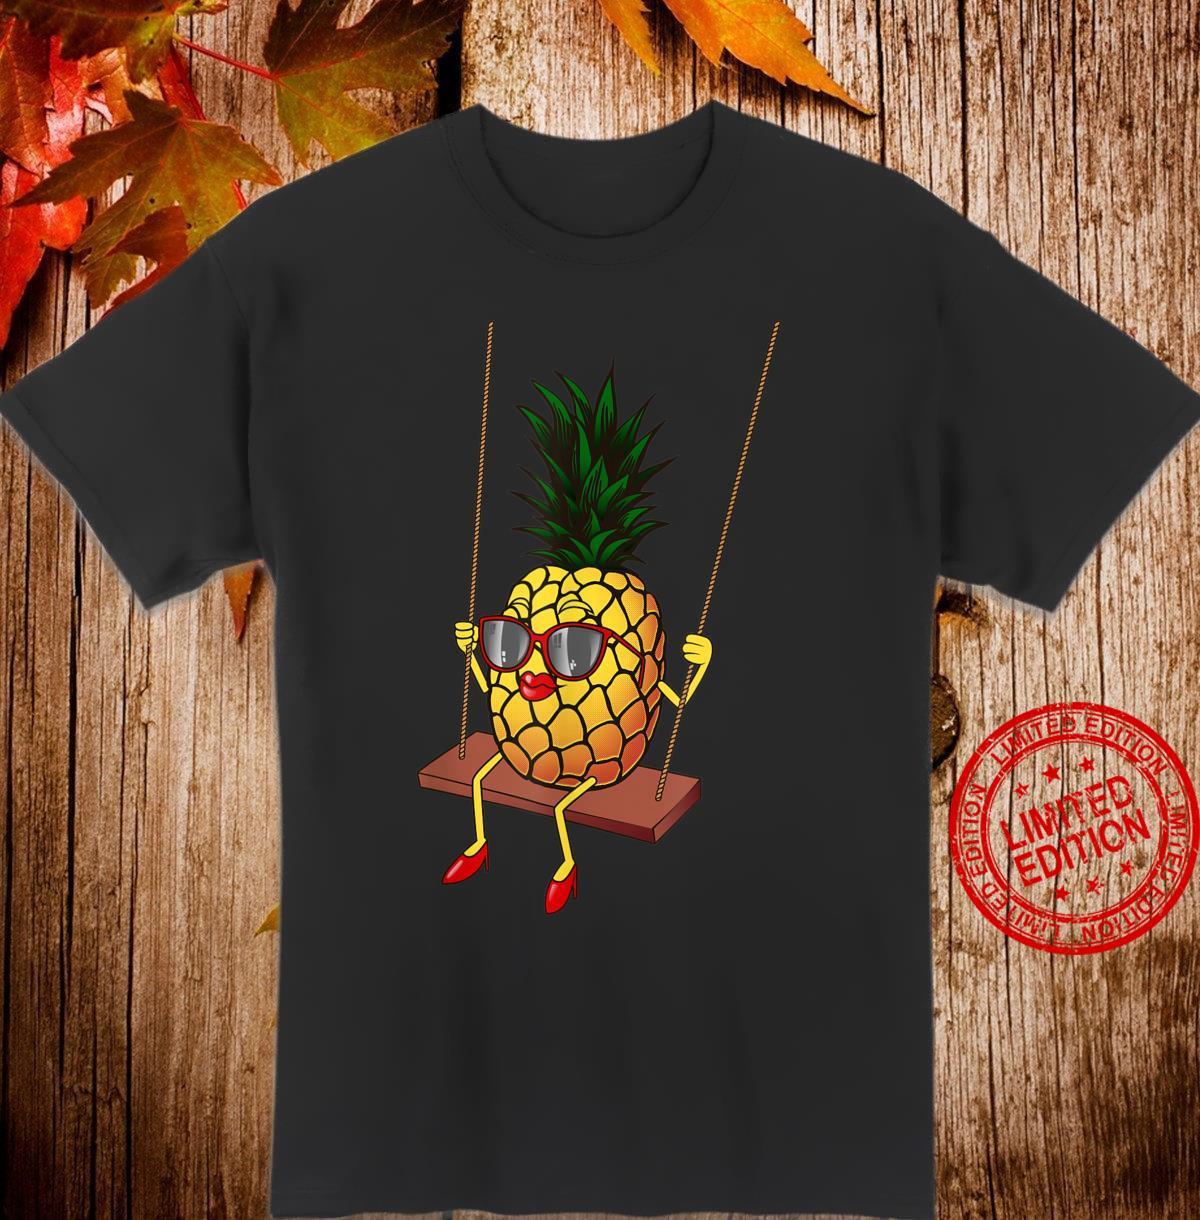 Funny Swinging Pineapple Cute Swinger Shirt